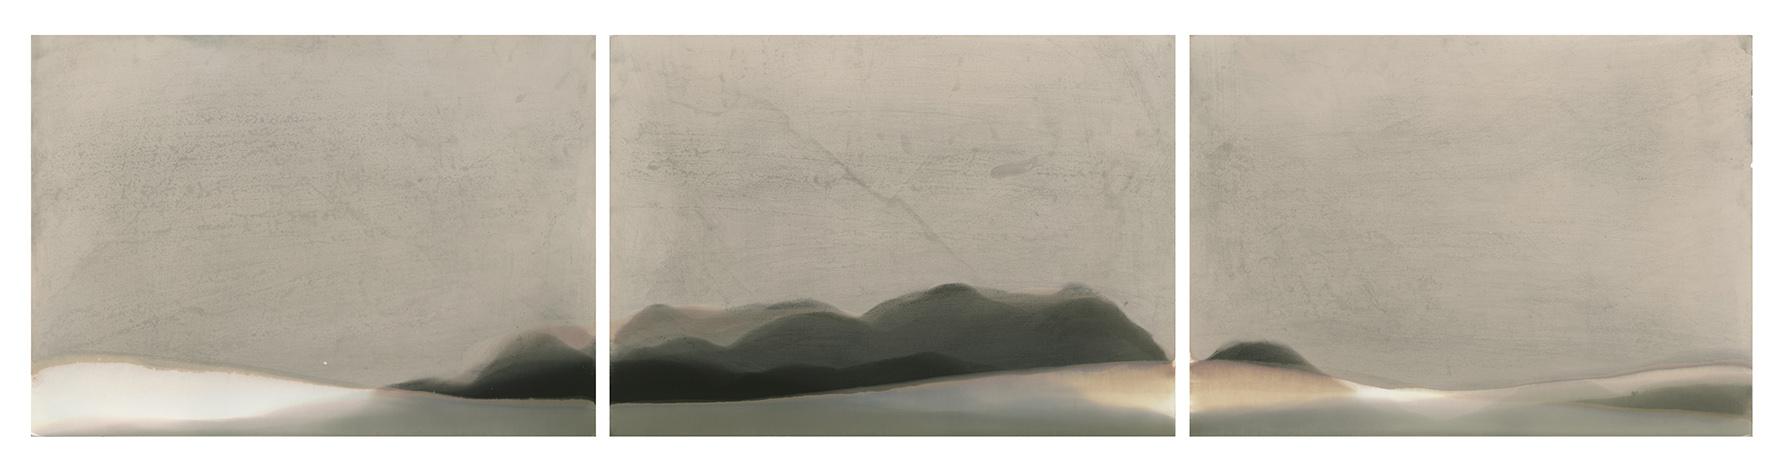 Lightfull landscapes